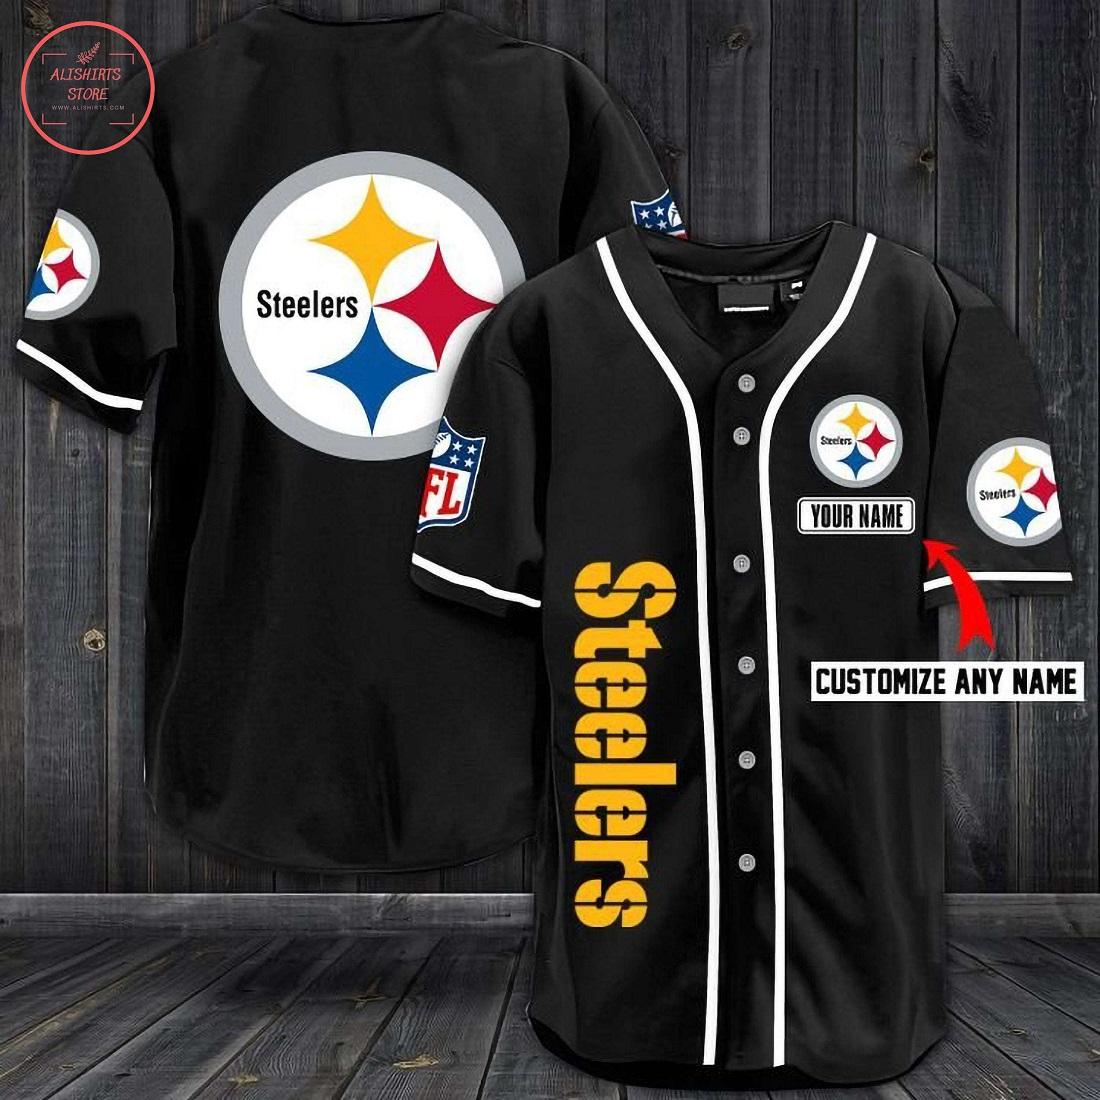 Pittsburgh Steelers Personalized Baseball Jersey